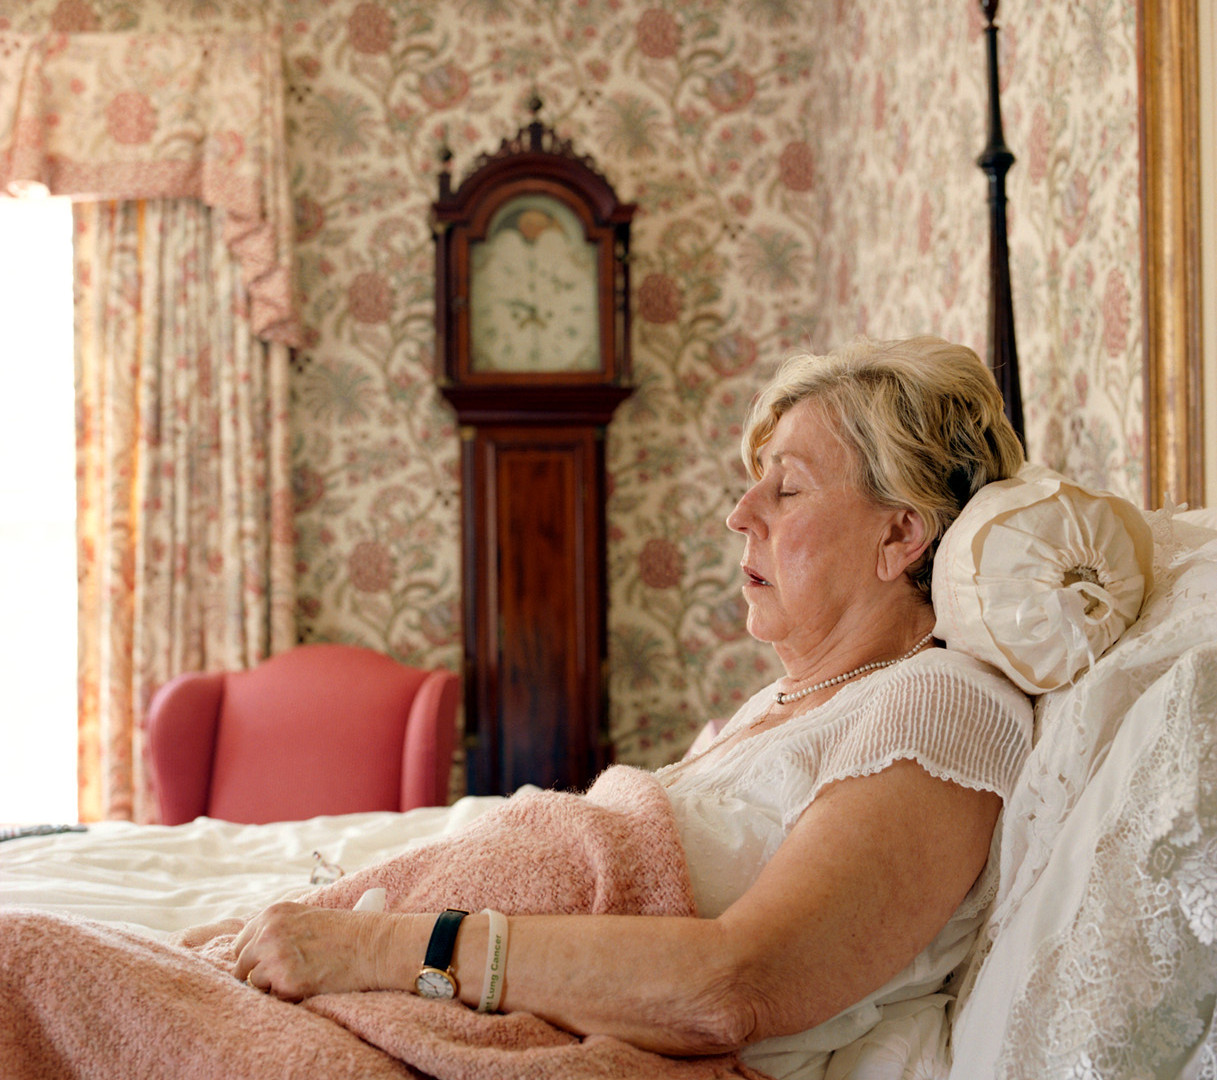 Jocelyn Lee, Untitled (Mom in bed), 2008